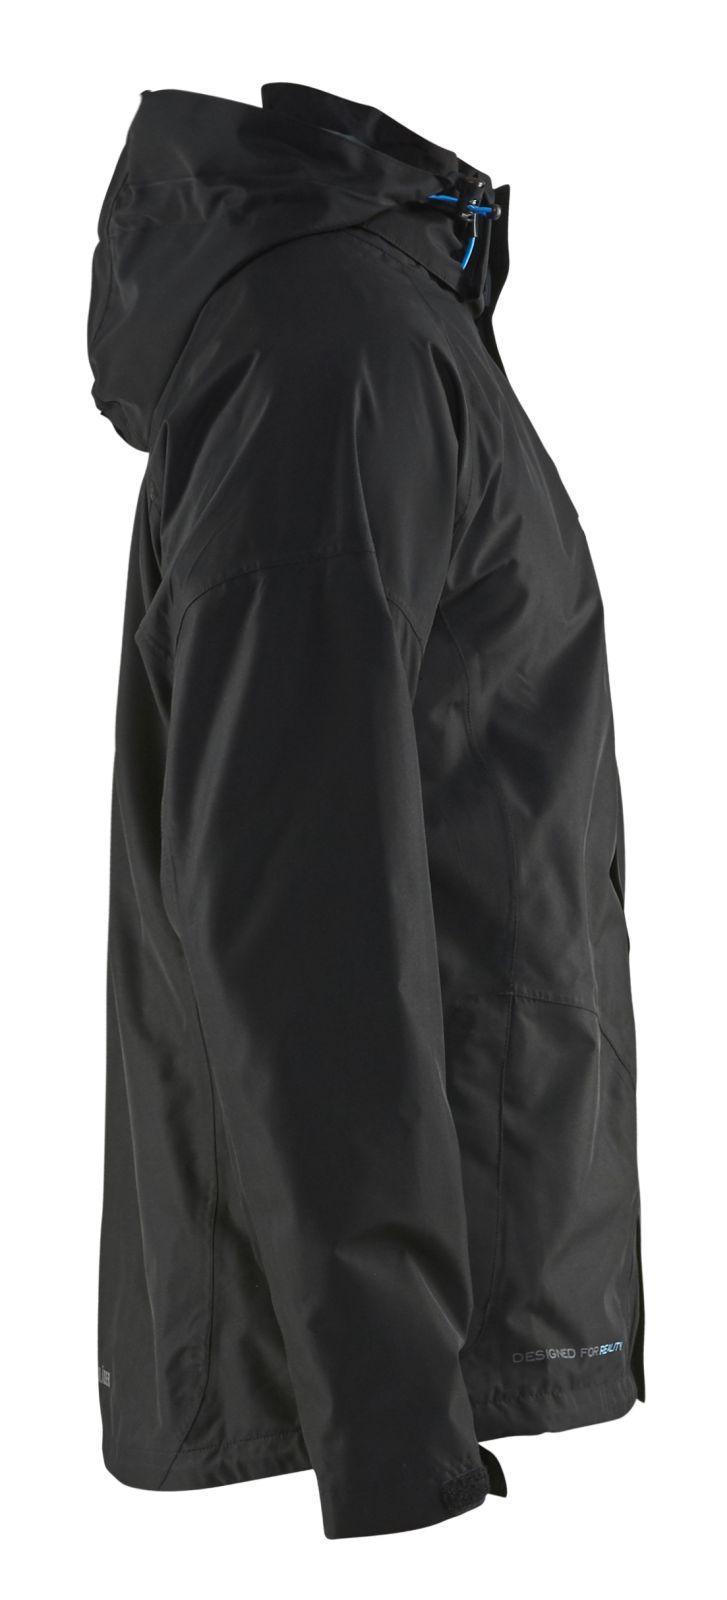 Blaklader Regenjacks 48661946 zwart(9900)